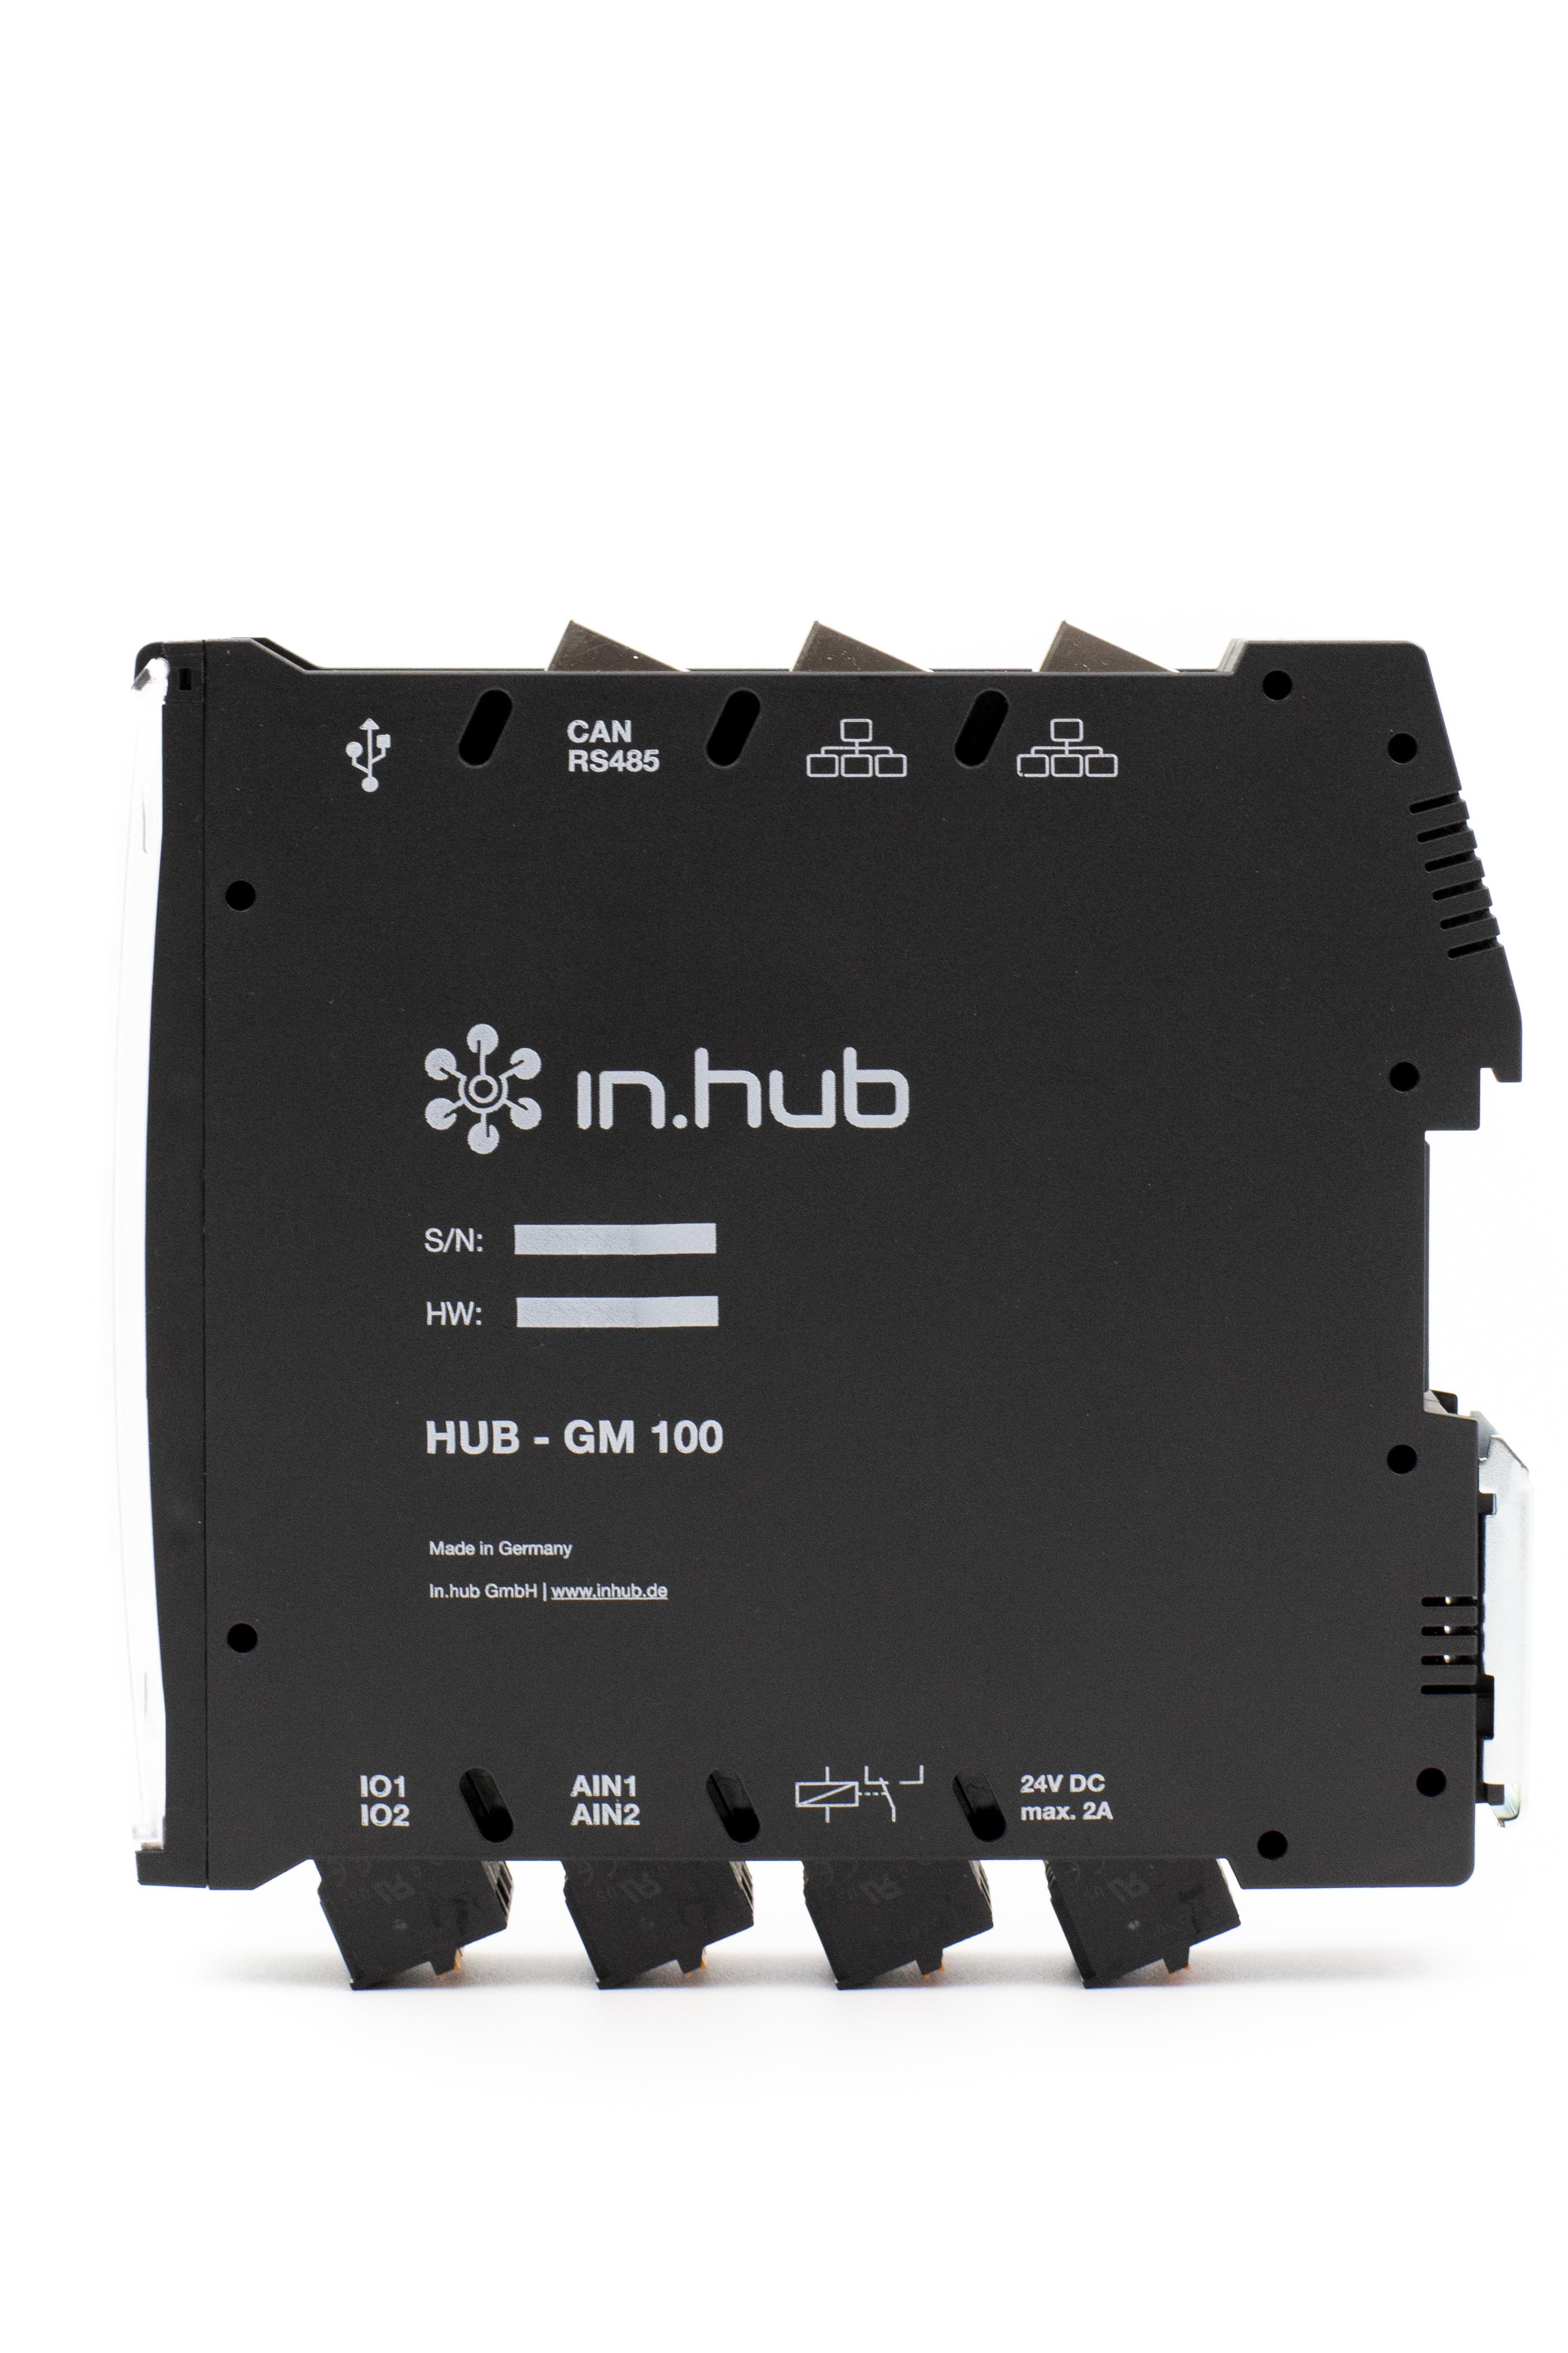 IIoT-Gateway HUB-GM100